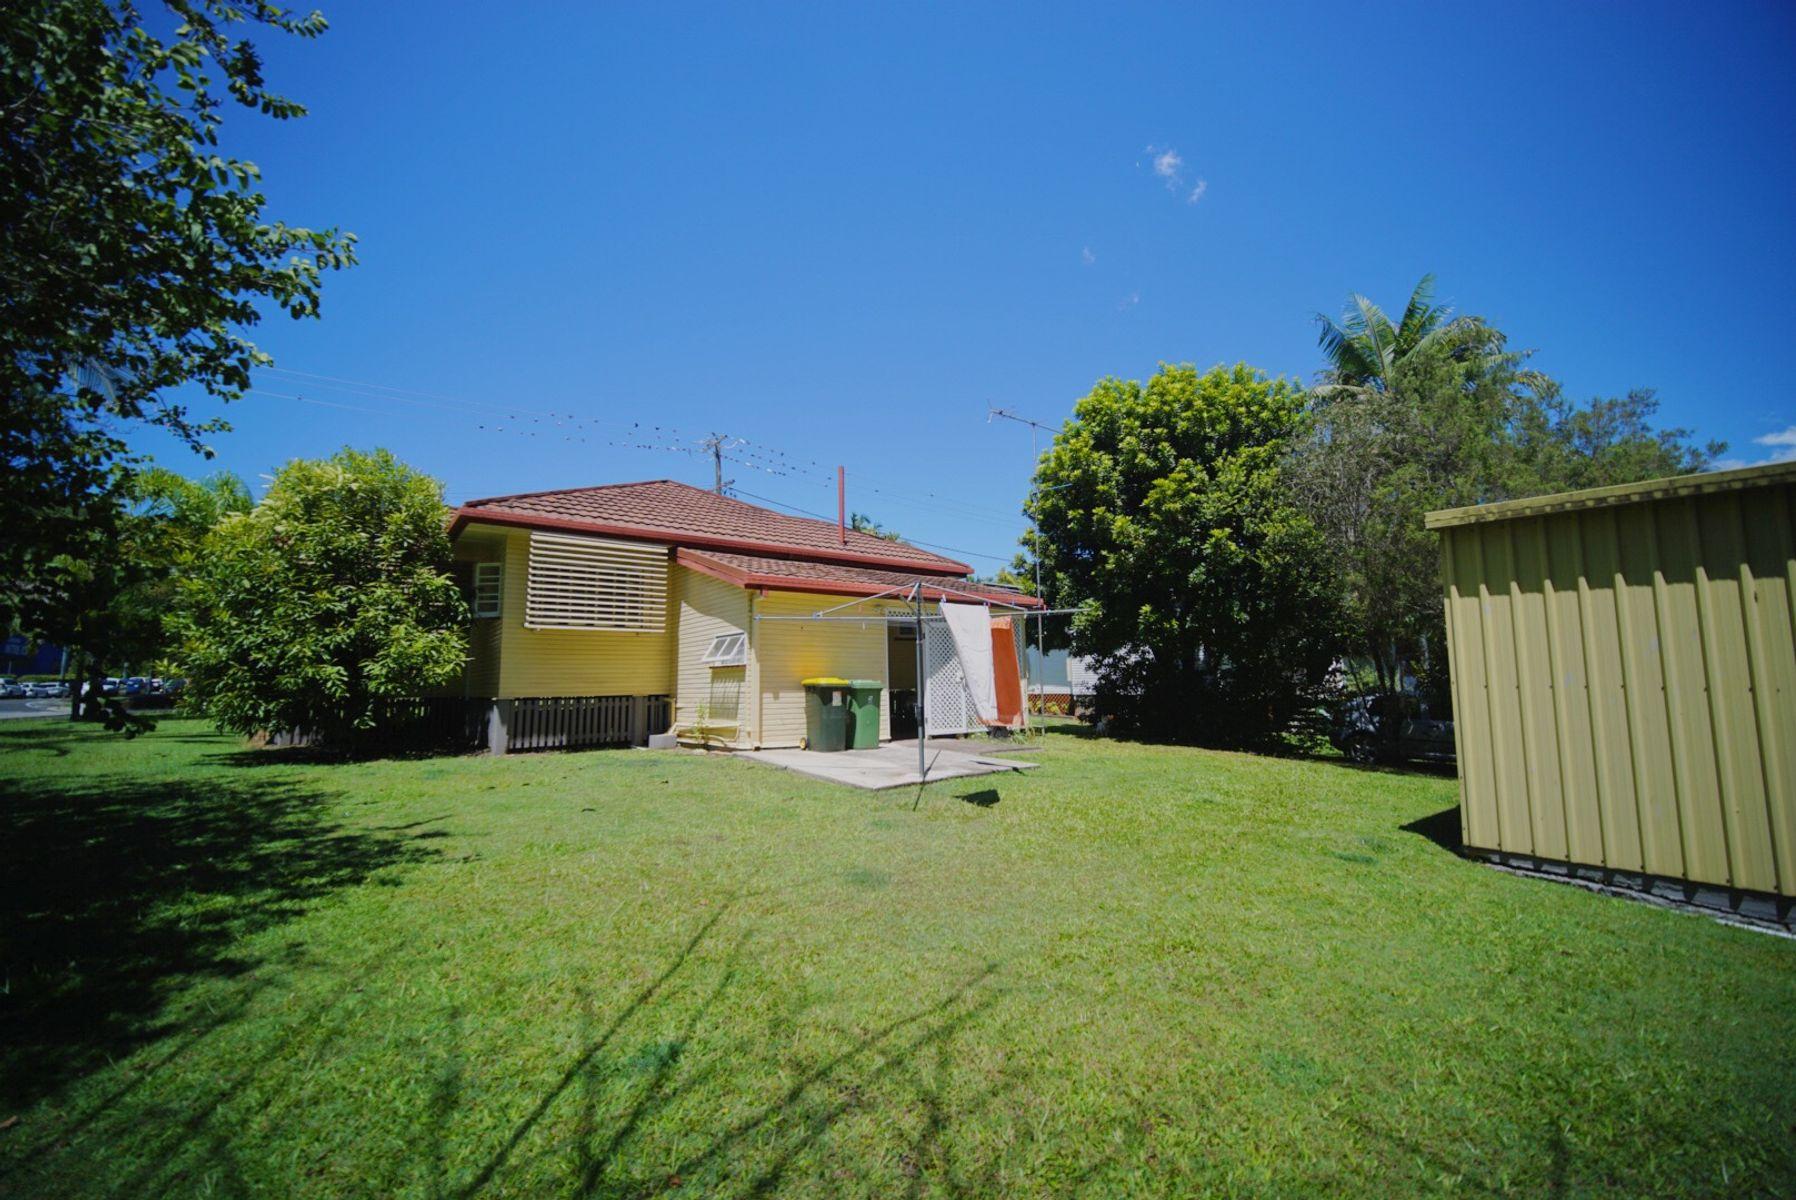 17 Hill Street, Nambour, QLD 4560